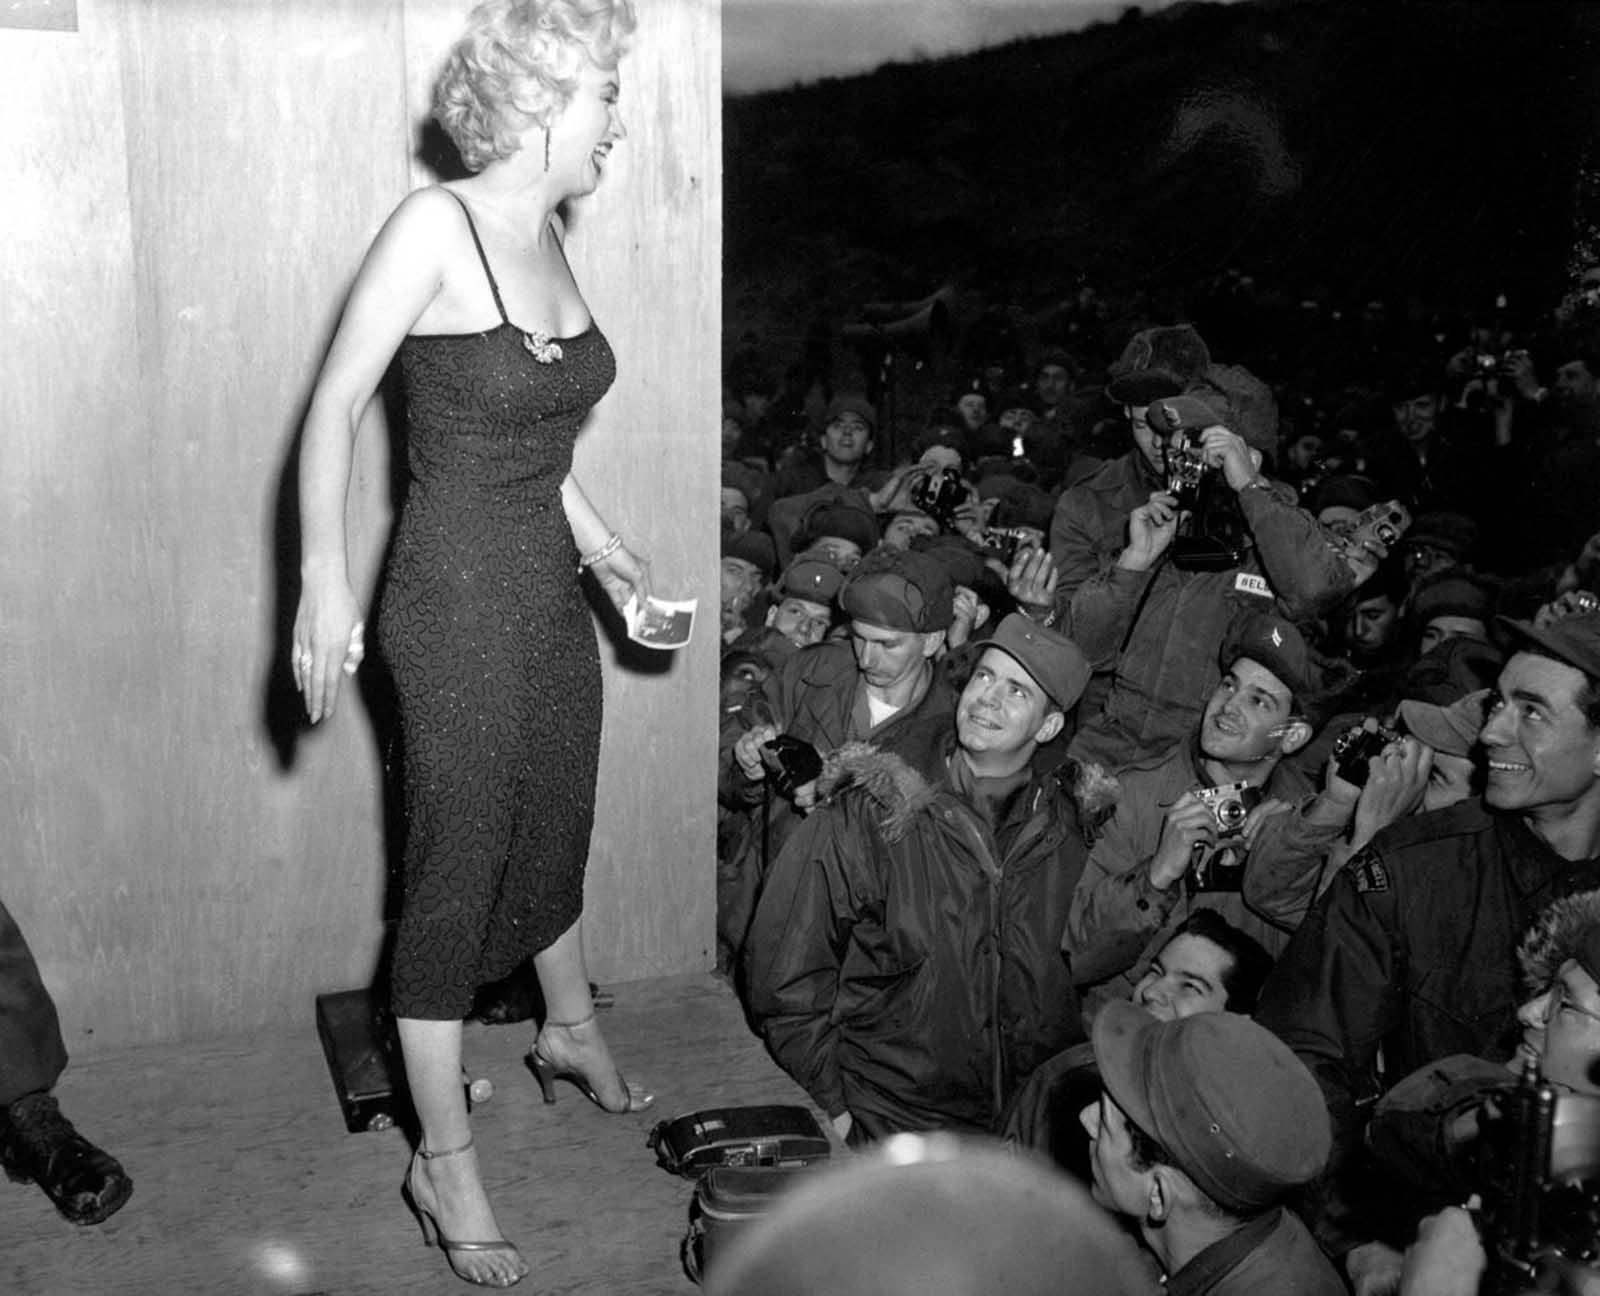 Monroe posing for soldiers in Korea.